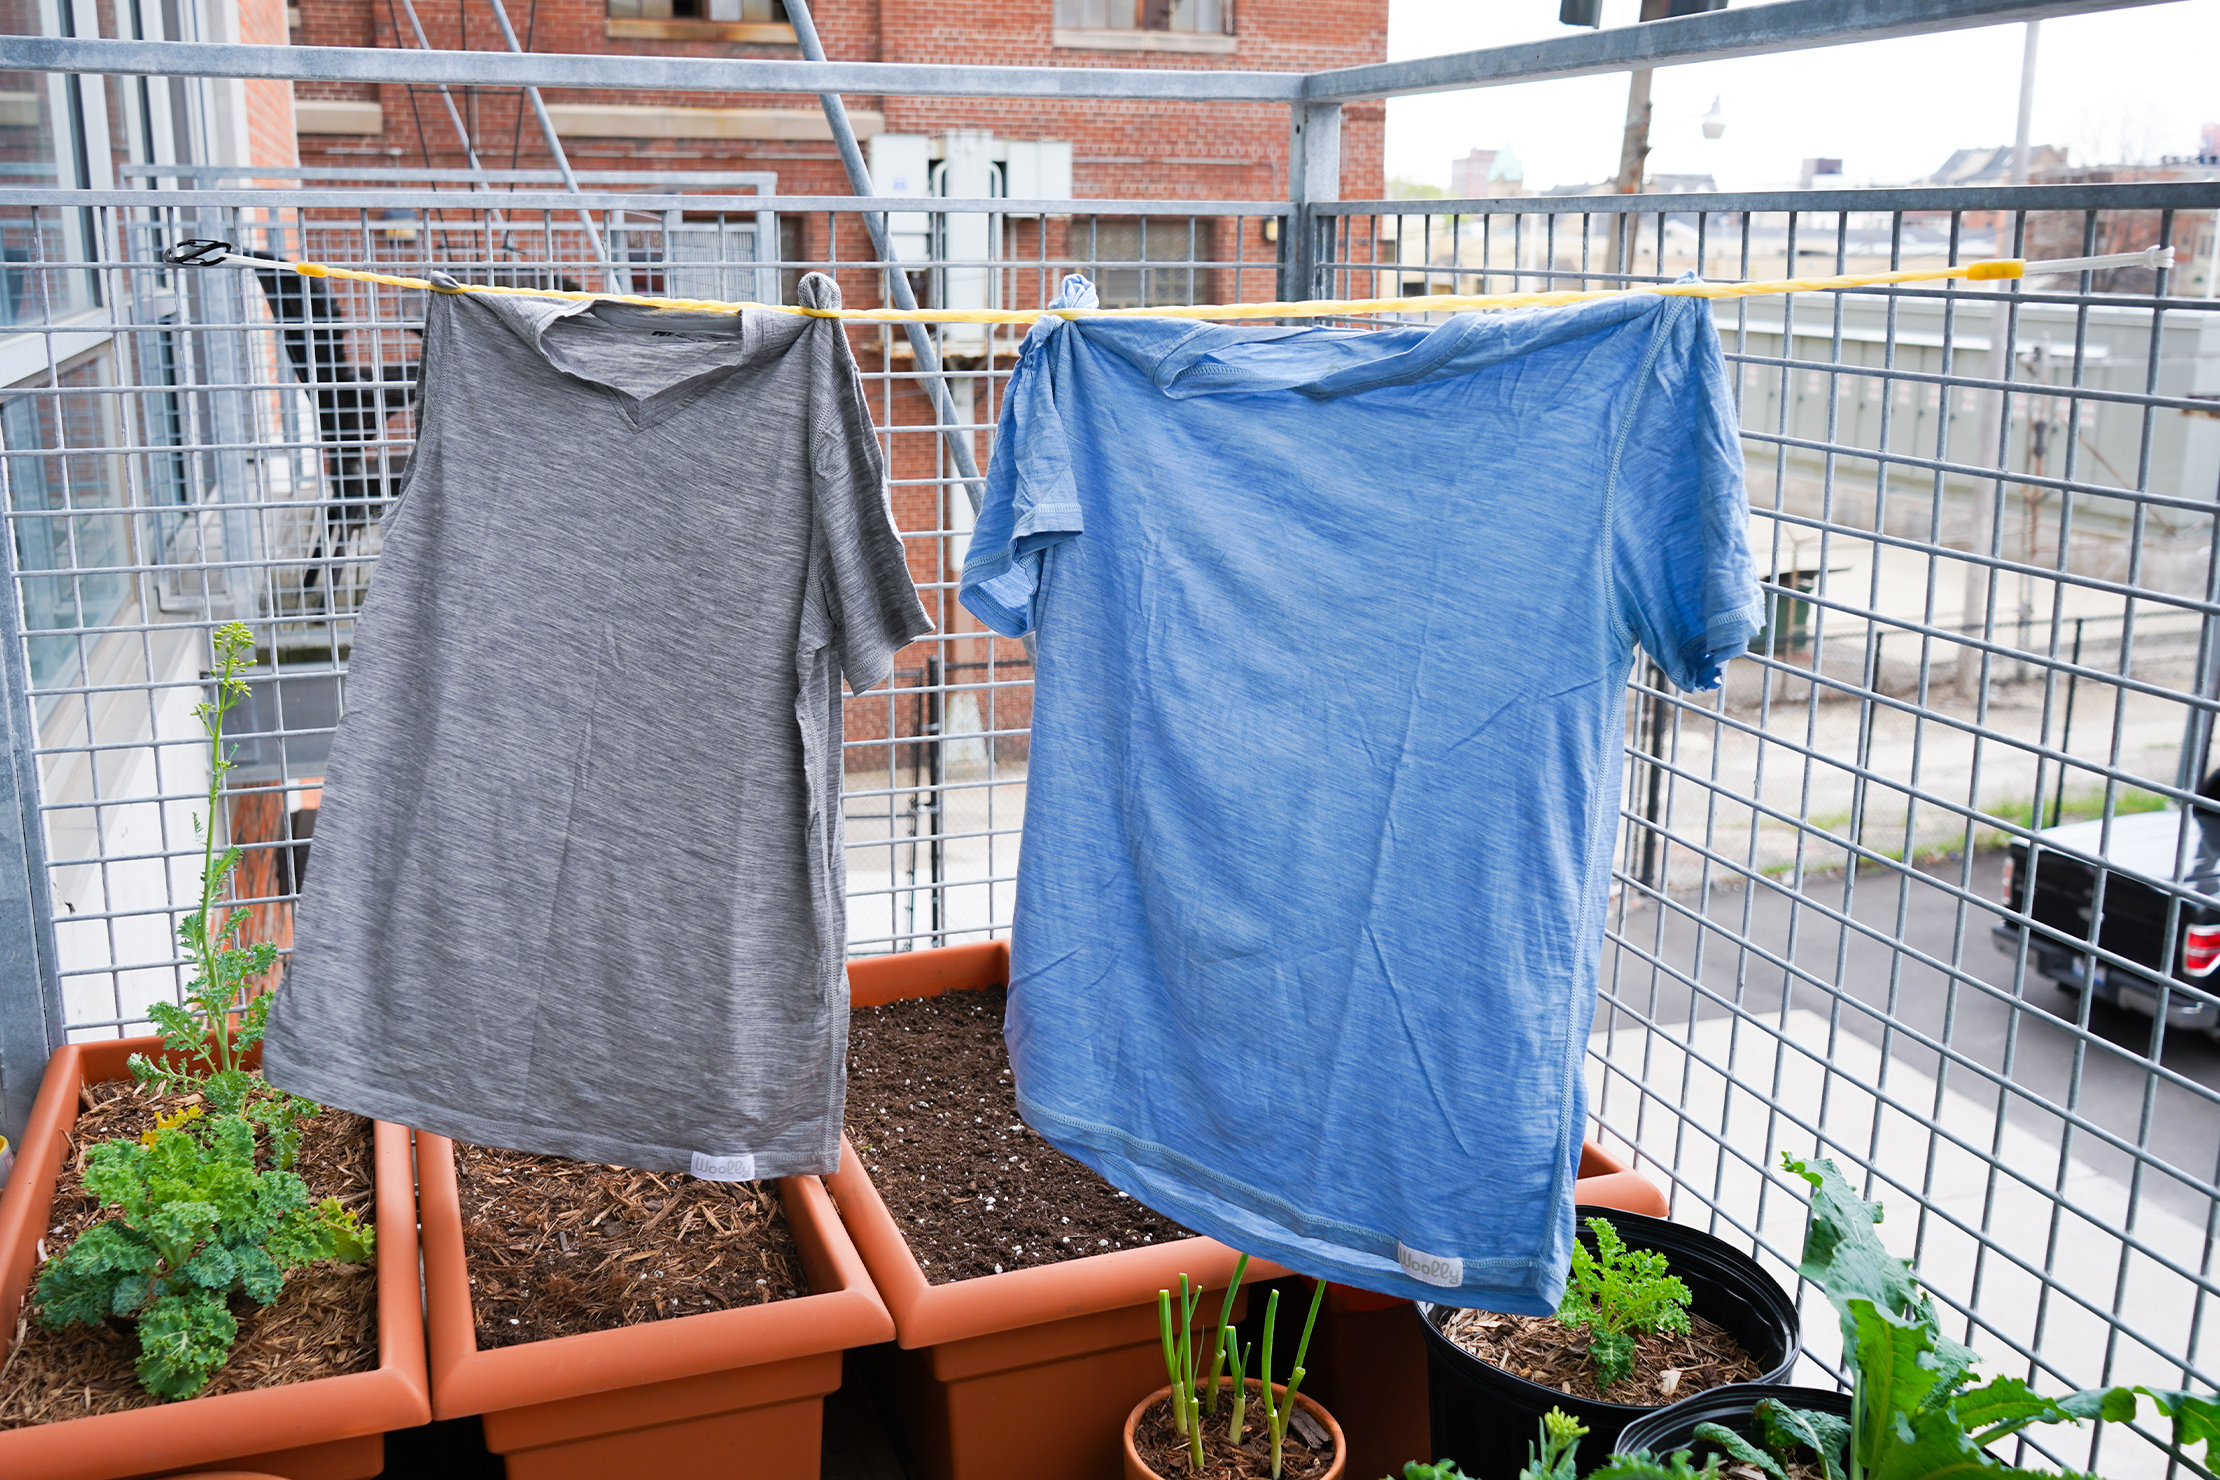 Flexo-Line Clothesline drying on the balcony